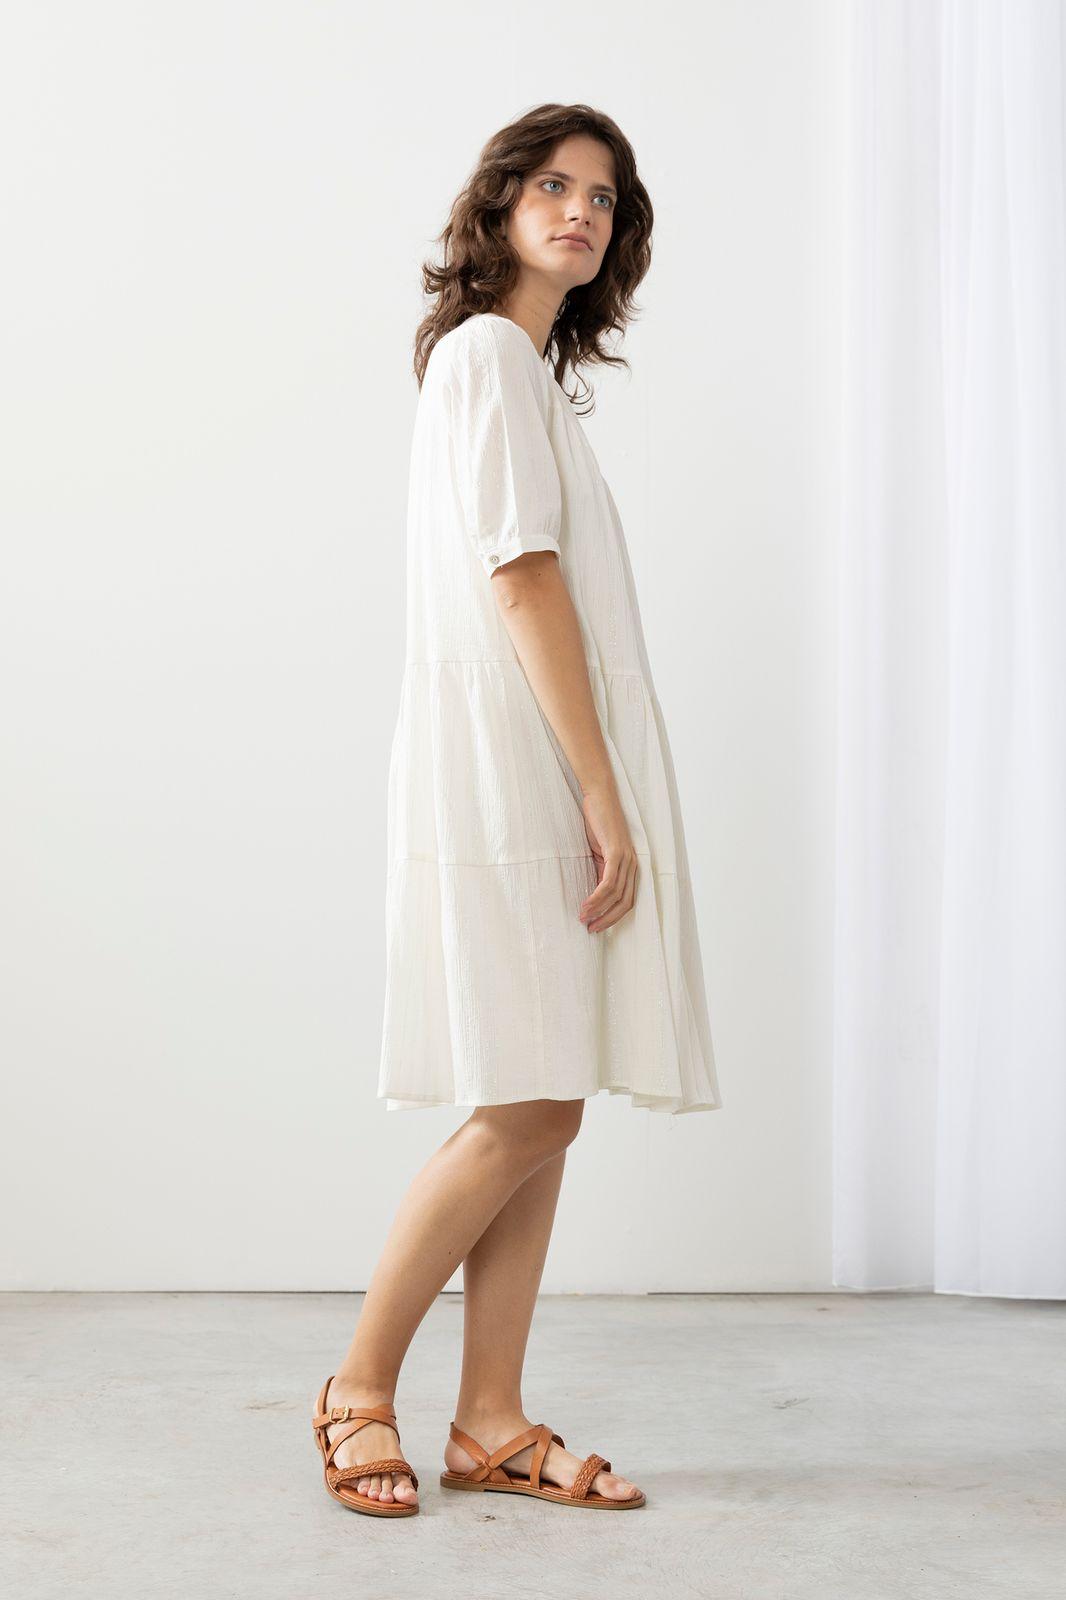 Witte jurk met zilveren stiksels